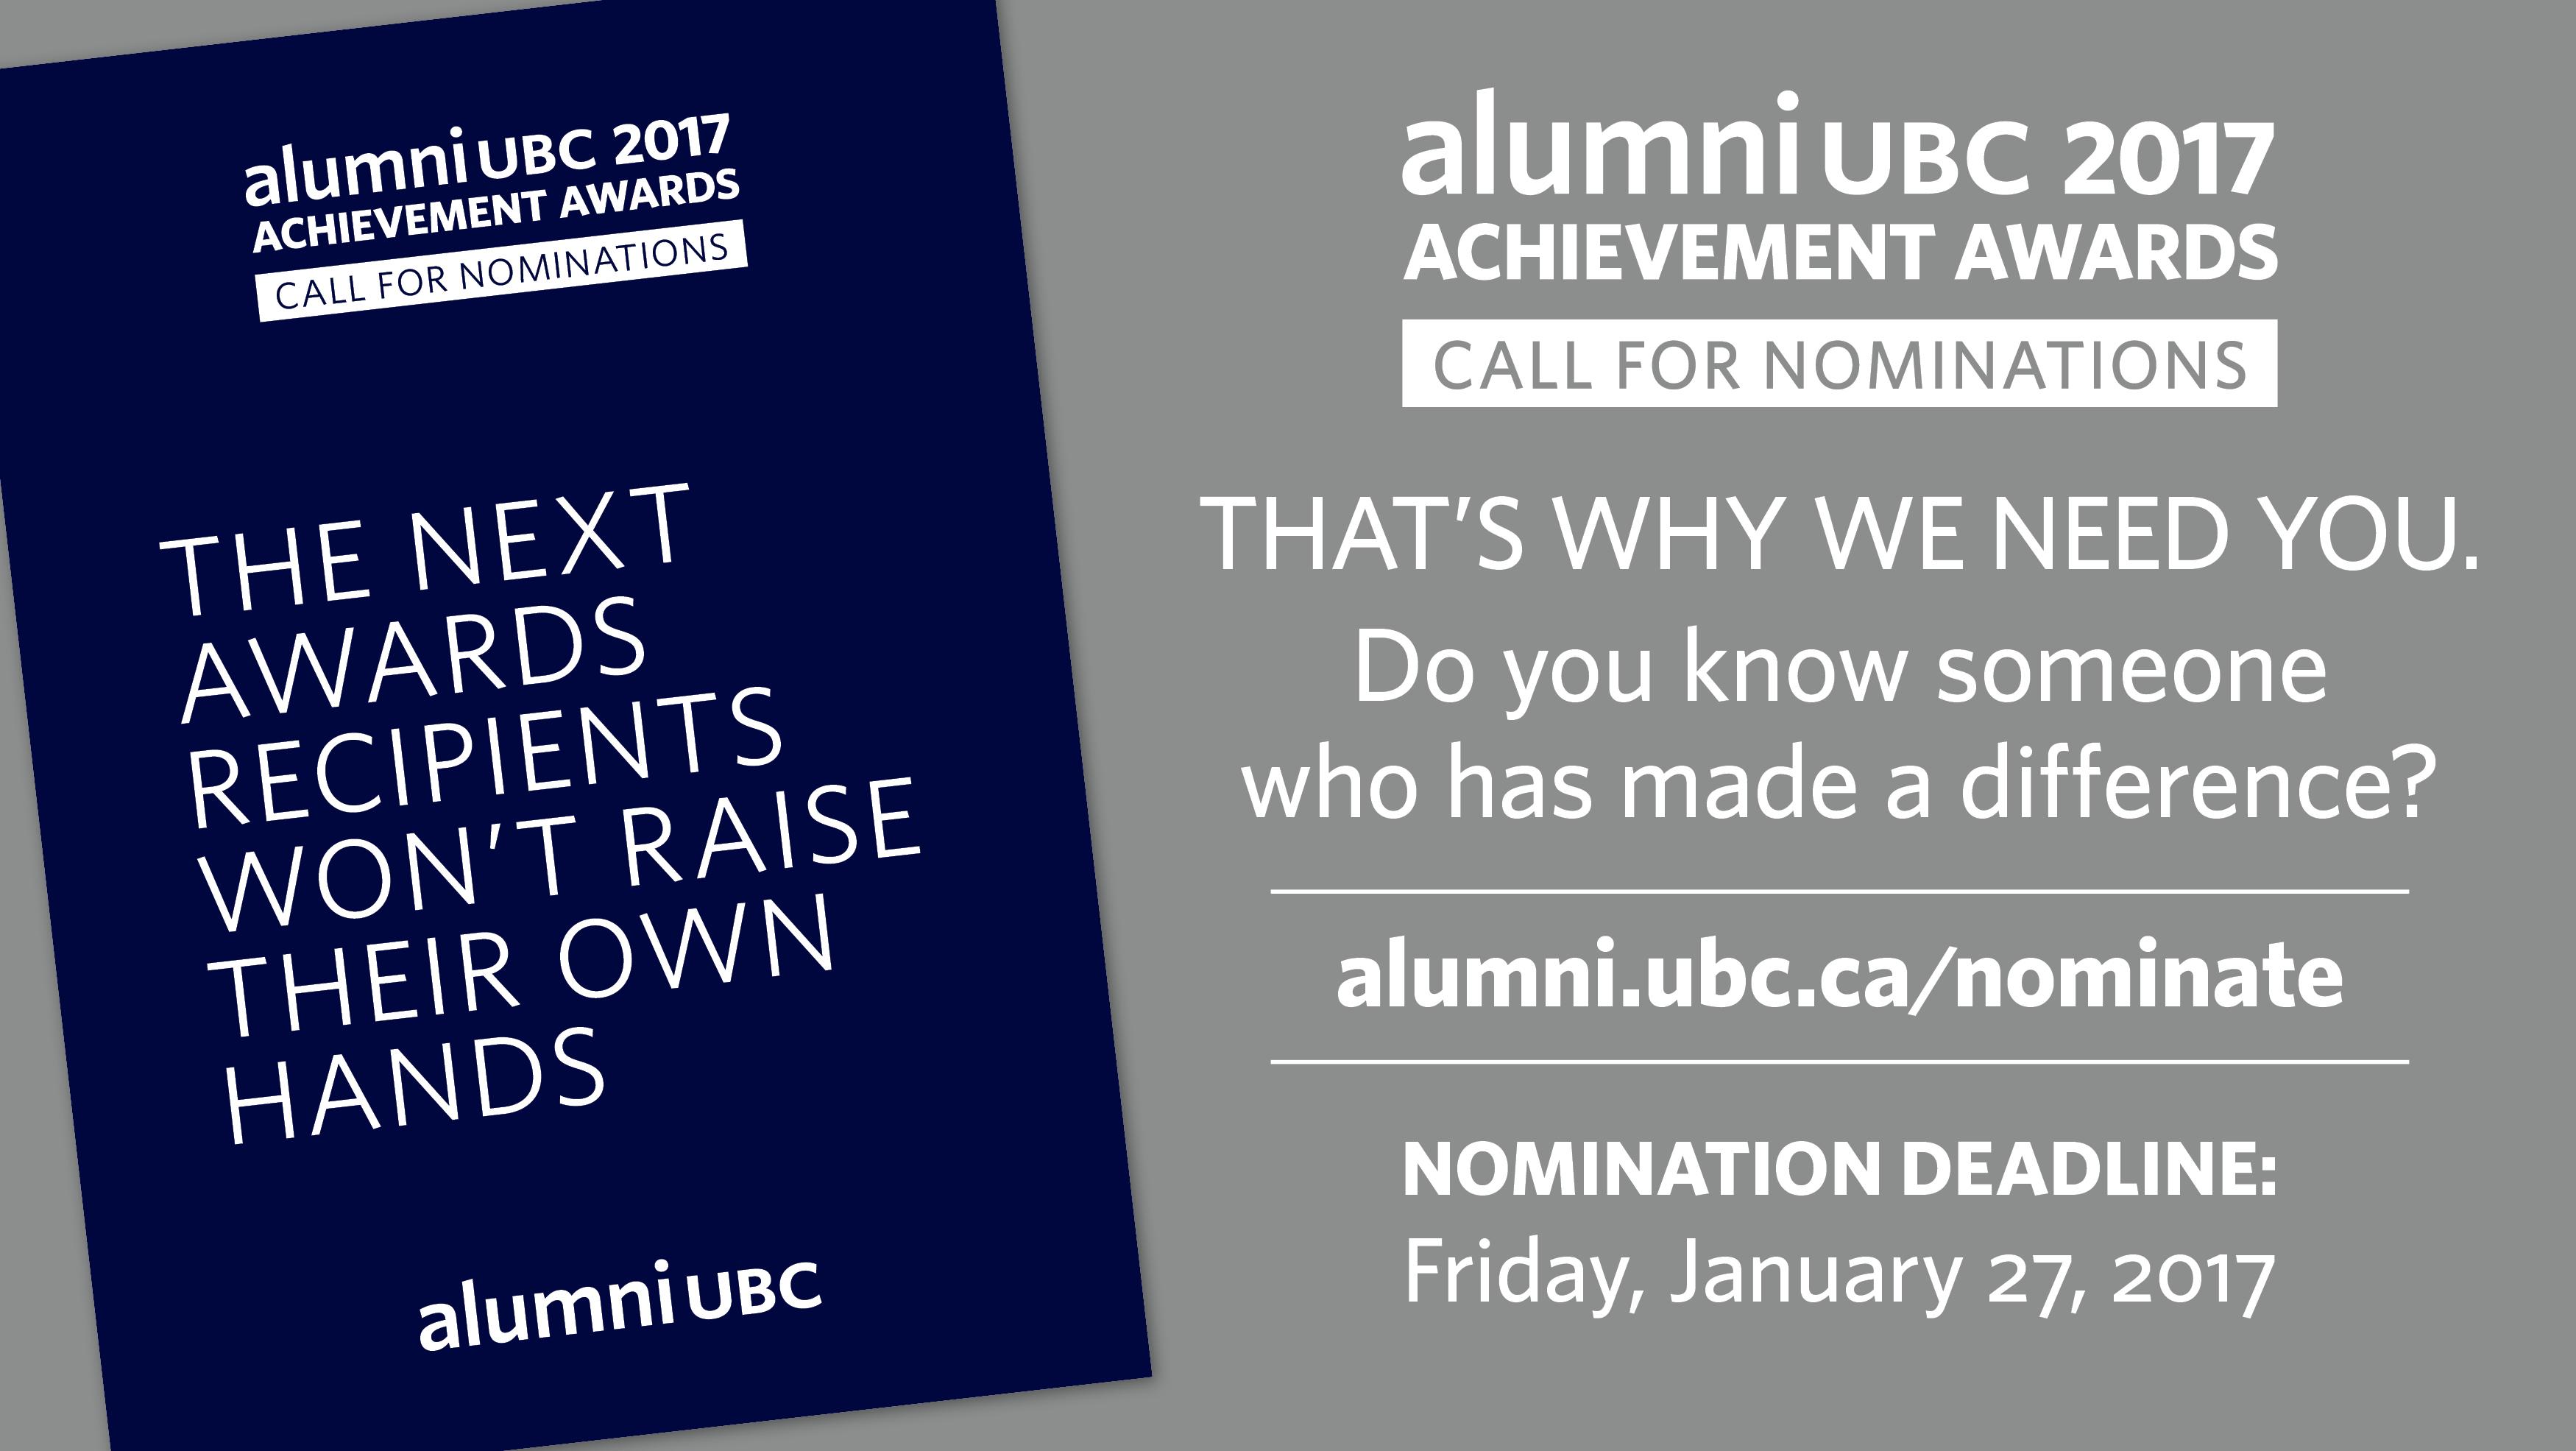 alumni UBC Achievement Awards Nominations